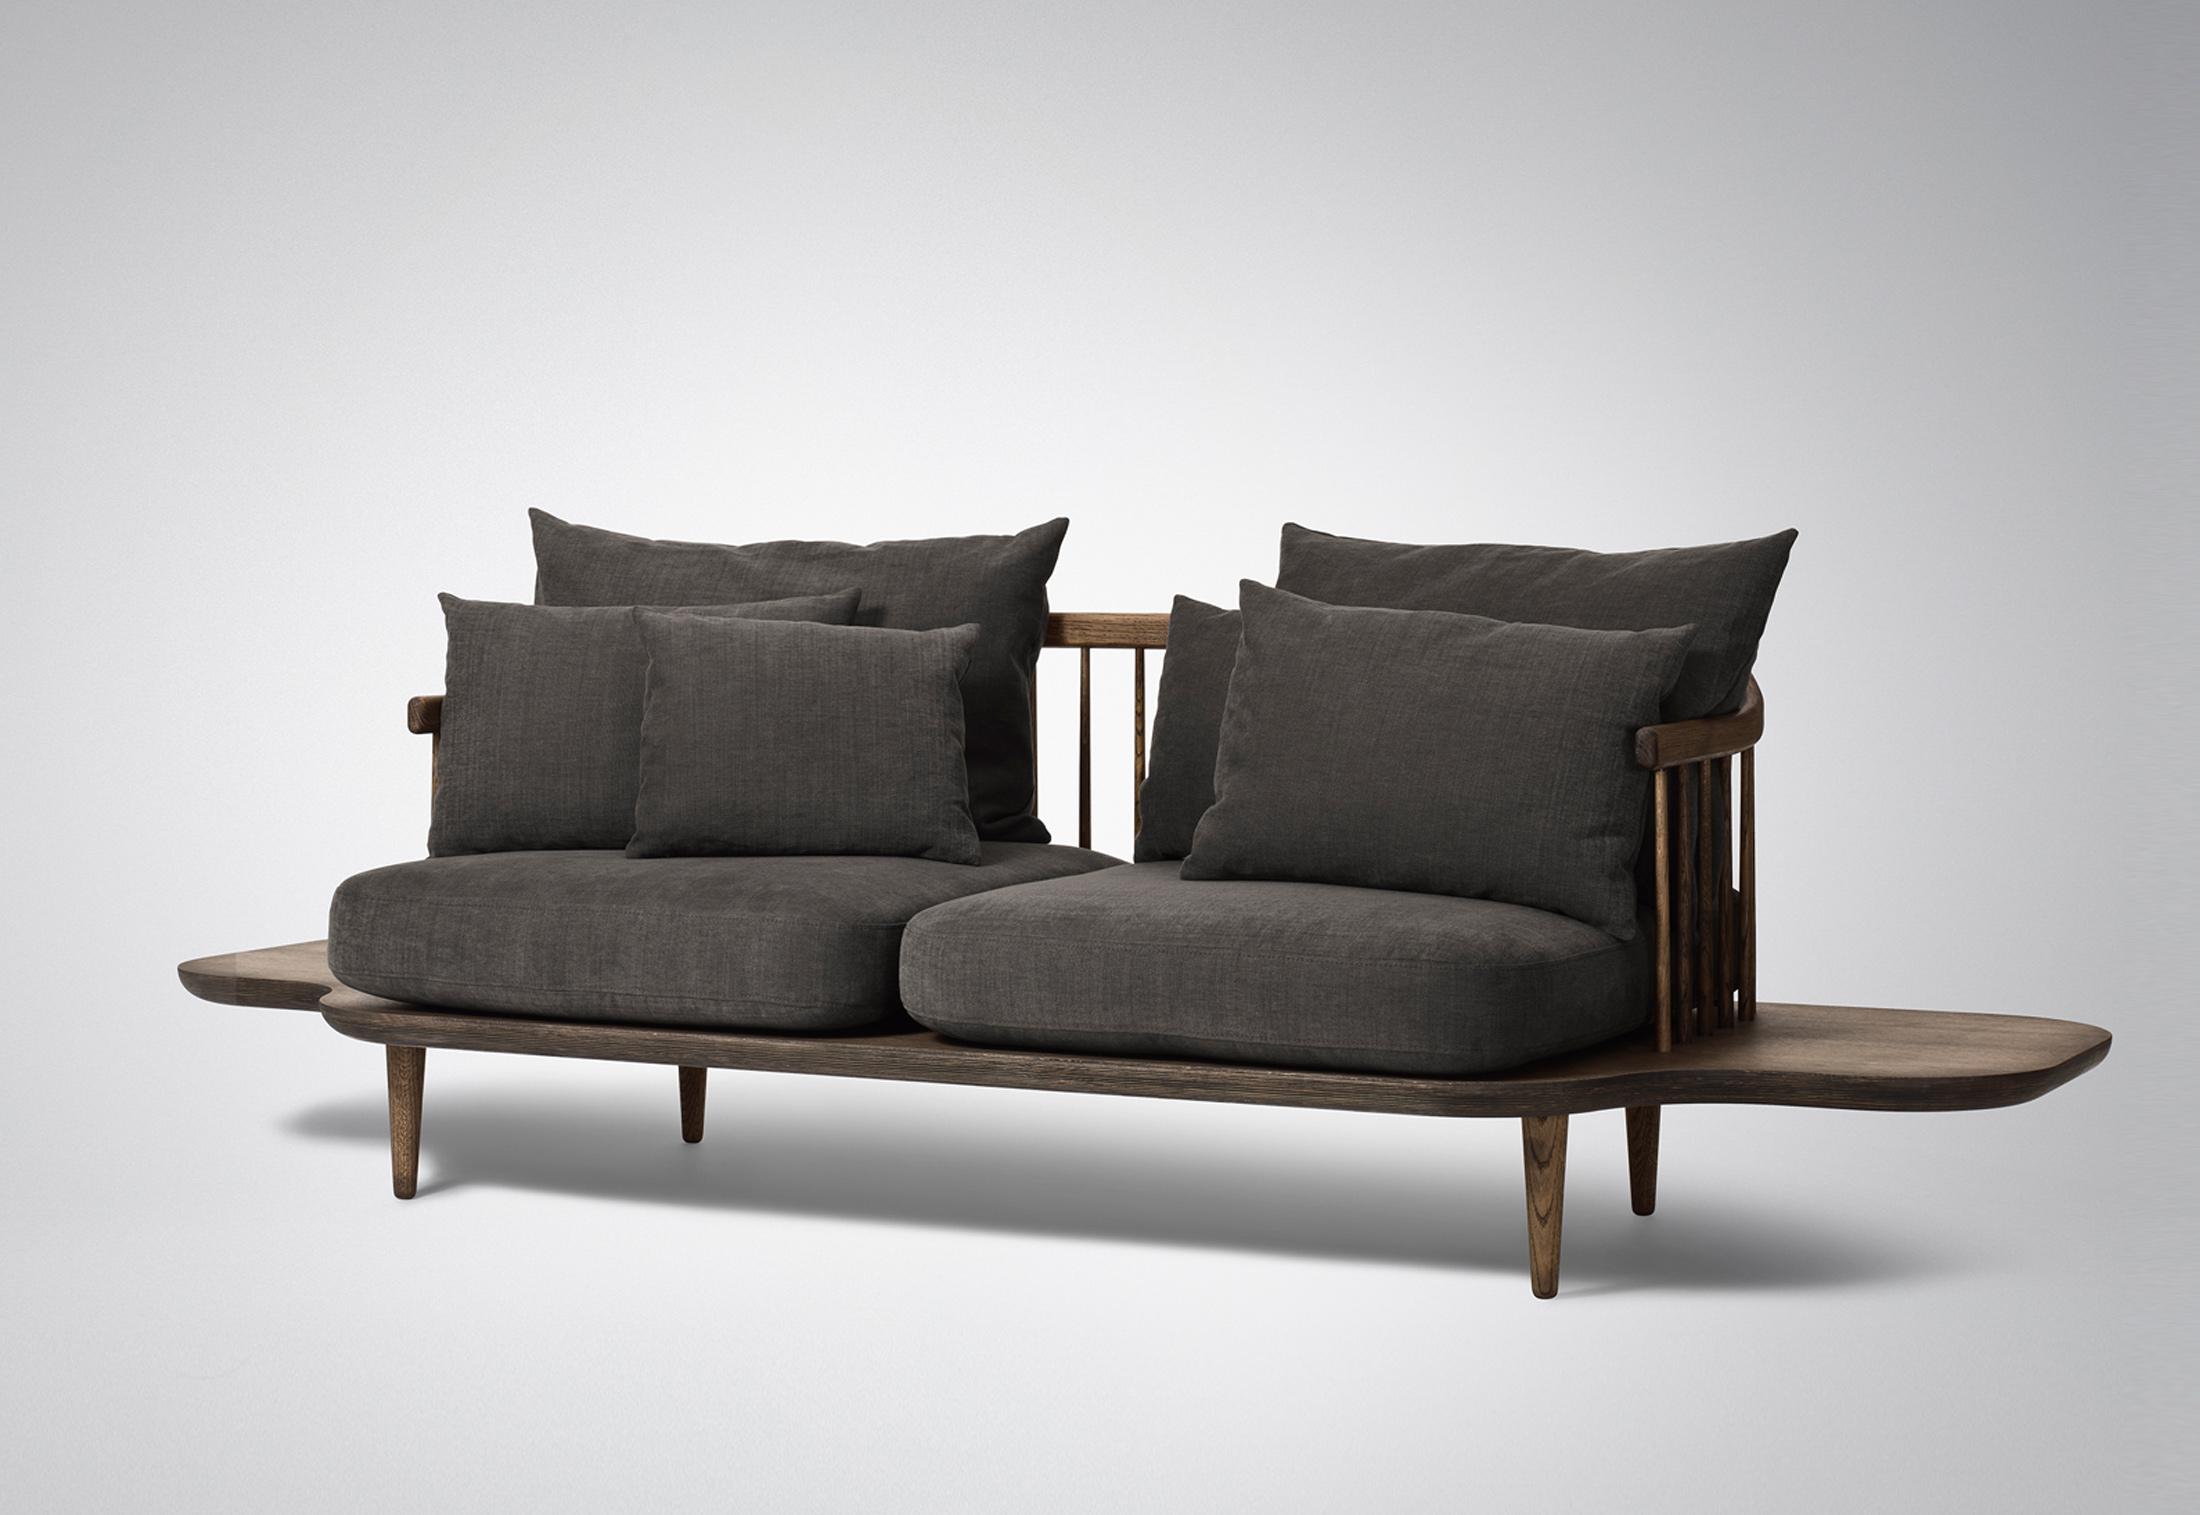 Wundervoll Koinor Lederfarben Referenz Von Amazing Affordable Awesome Fly Sofa Mit Ablage